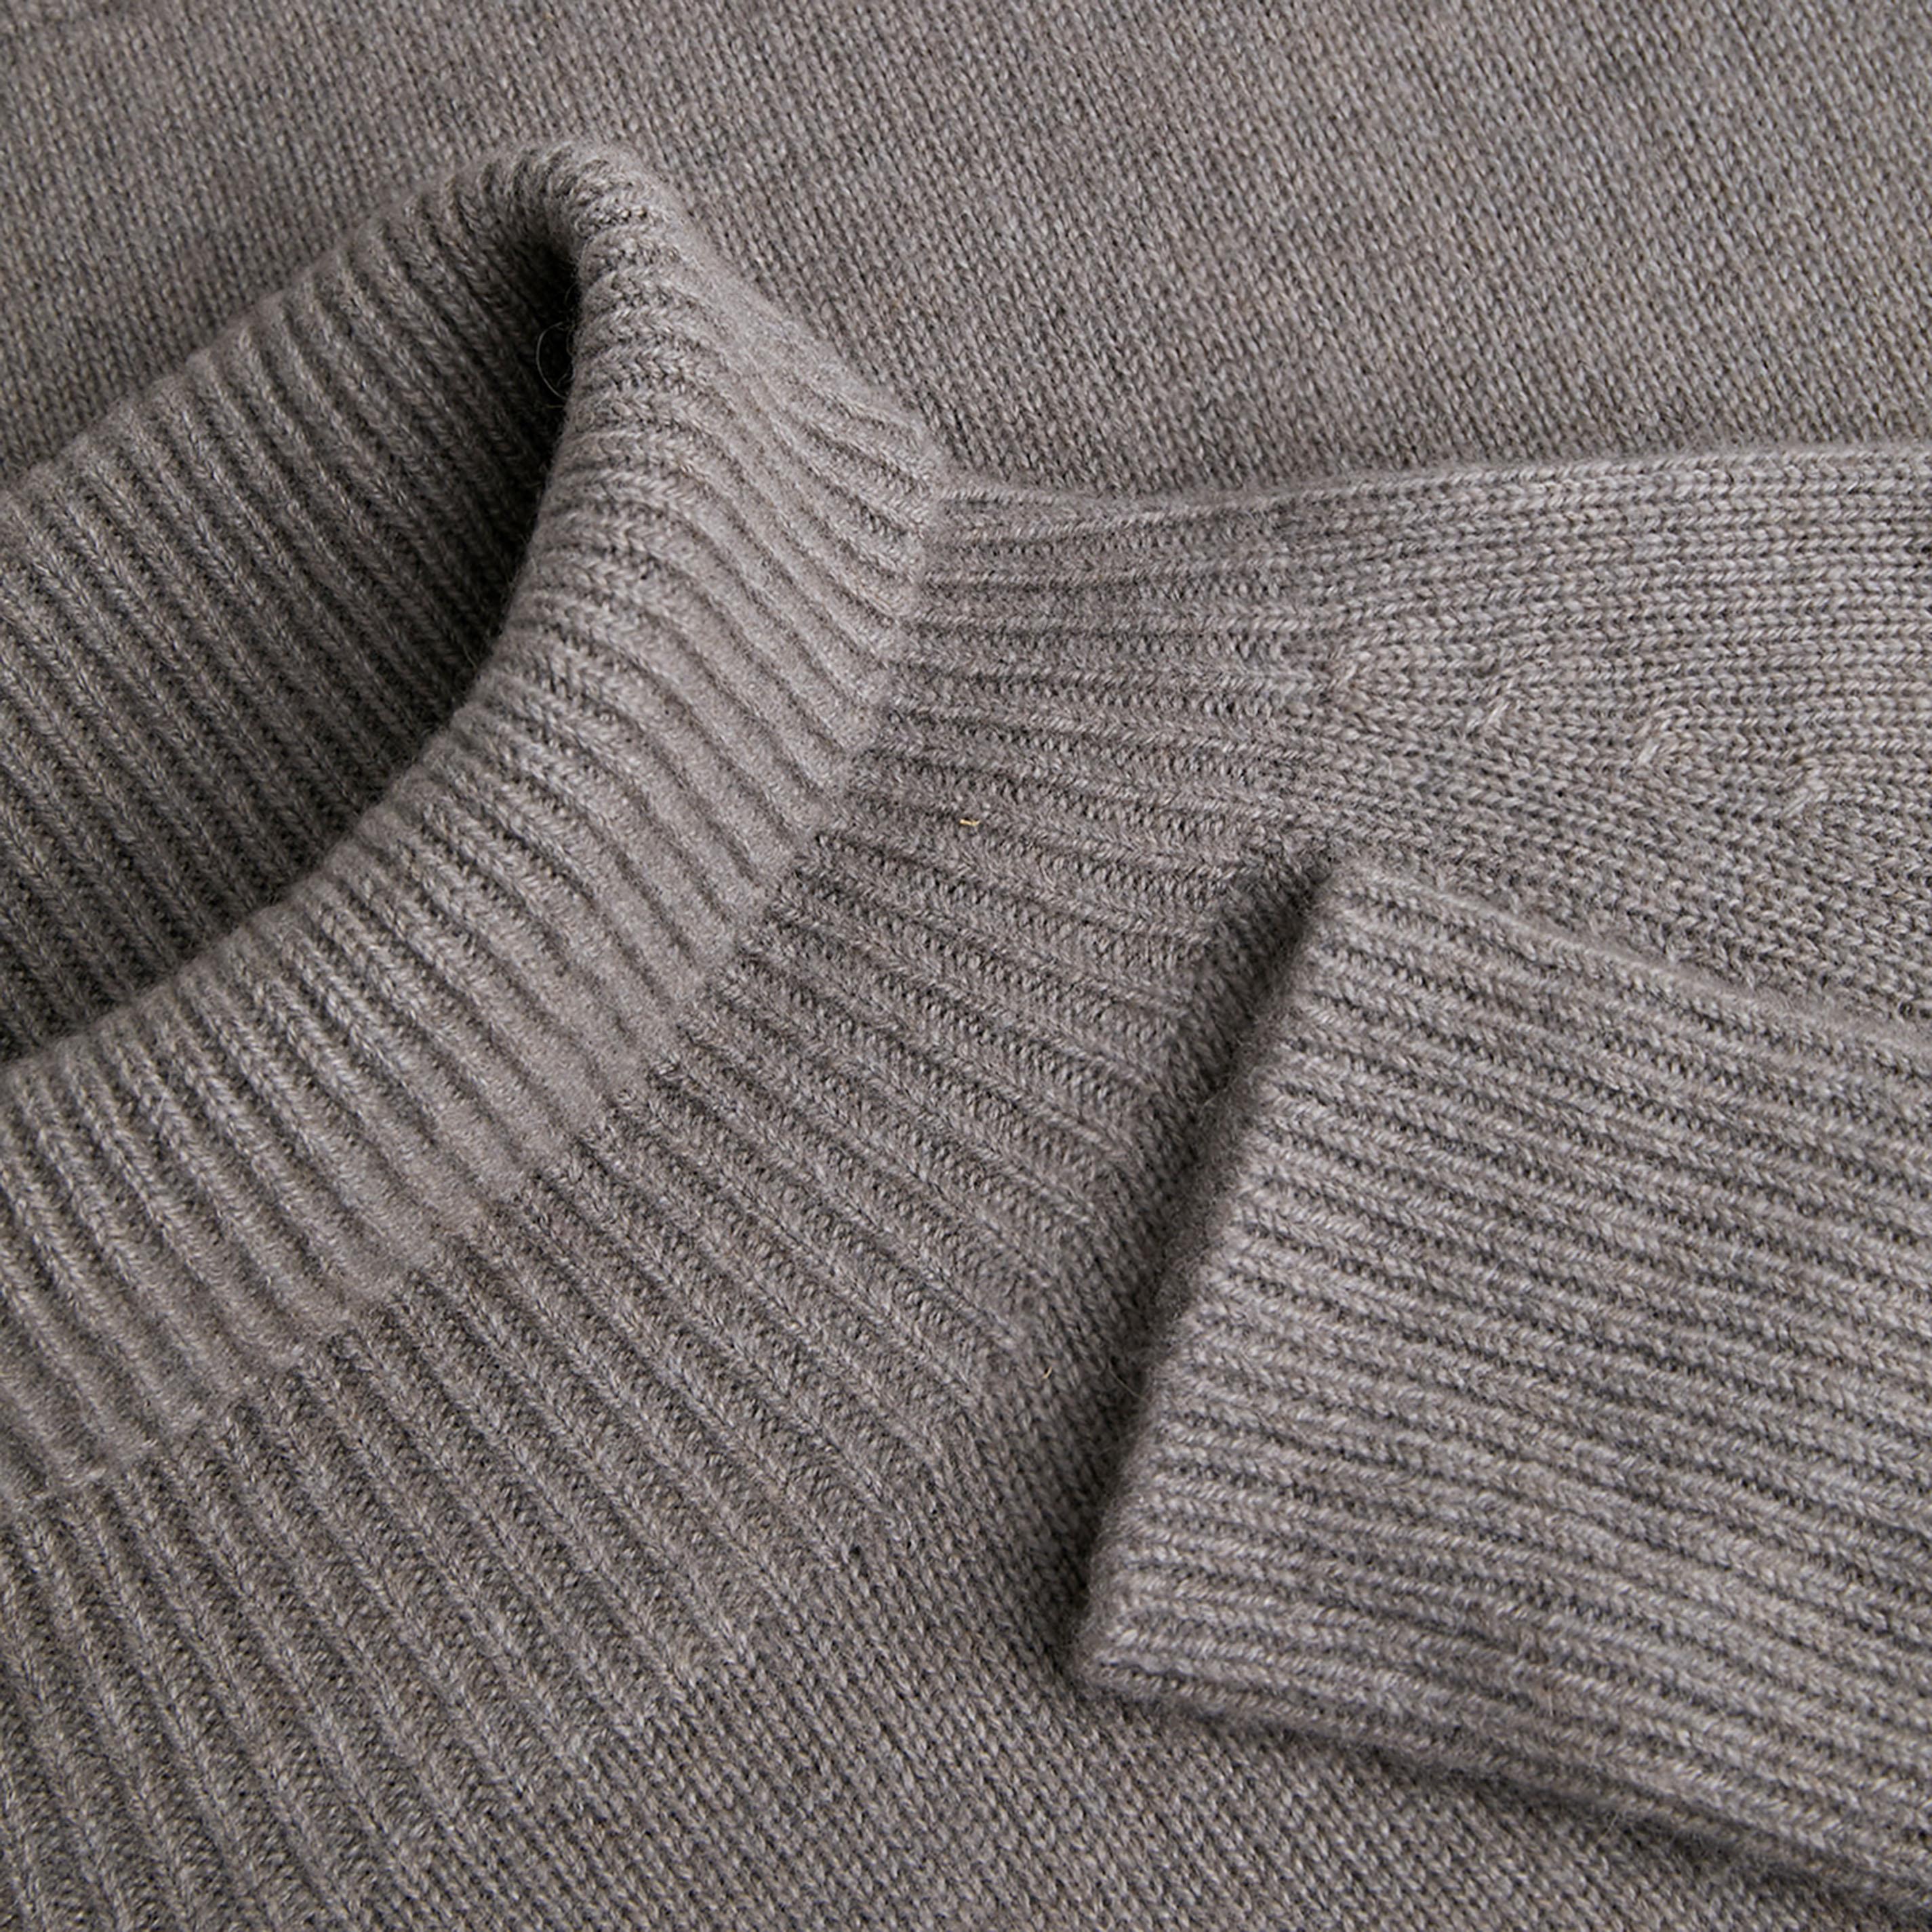 Cashmere Turtle Neck Sweater-Oat Grey - Oat Grey S